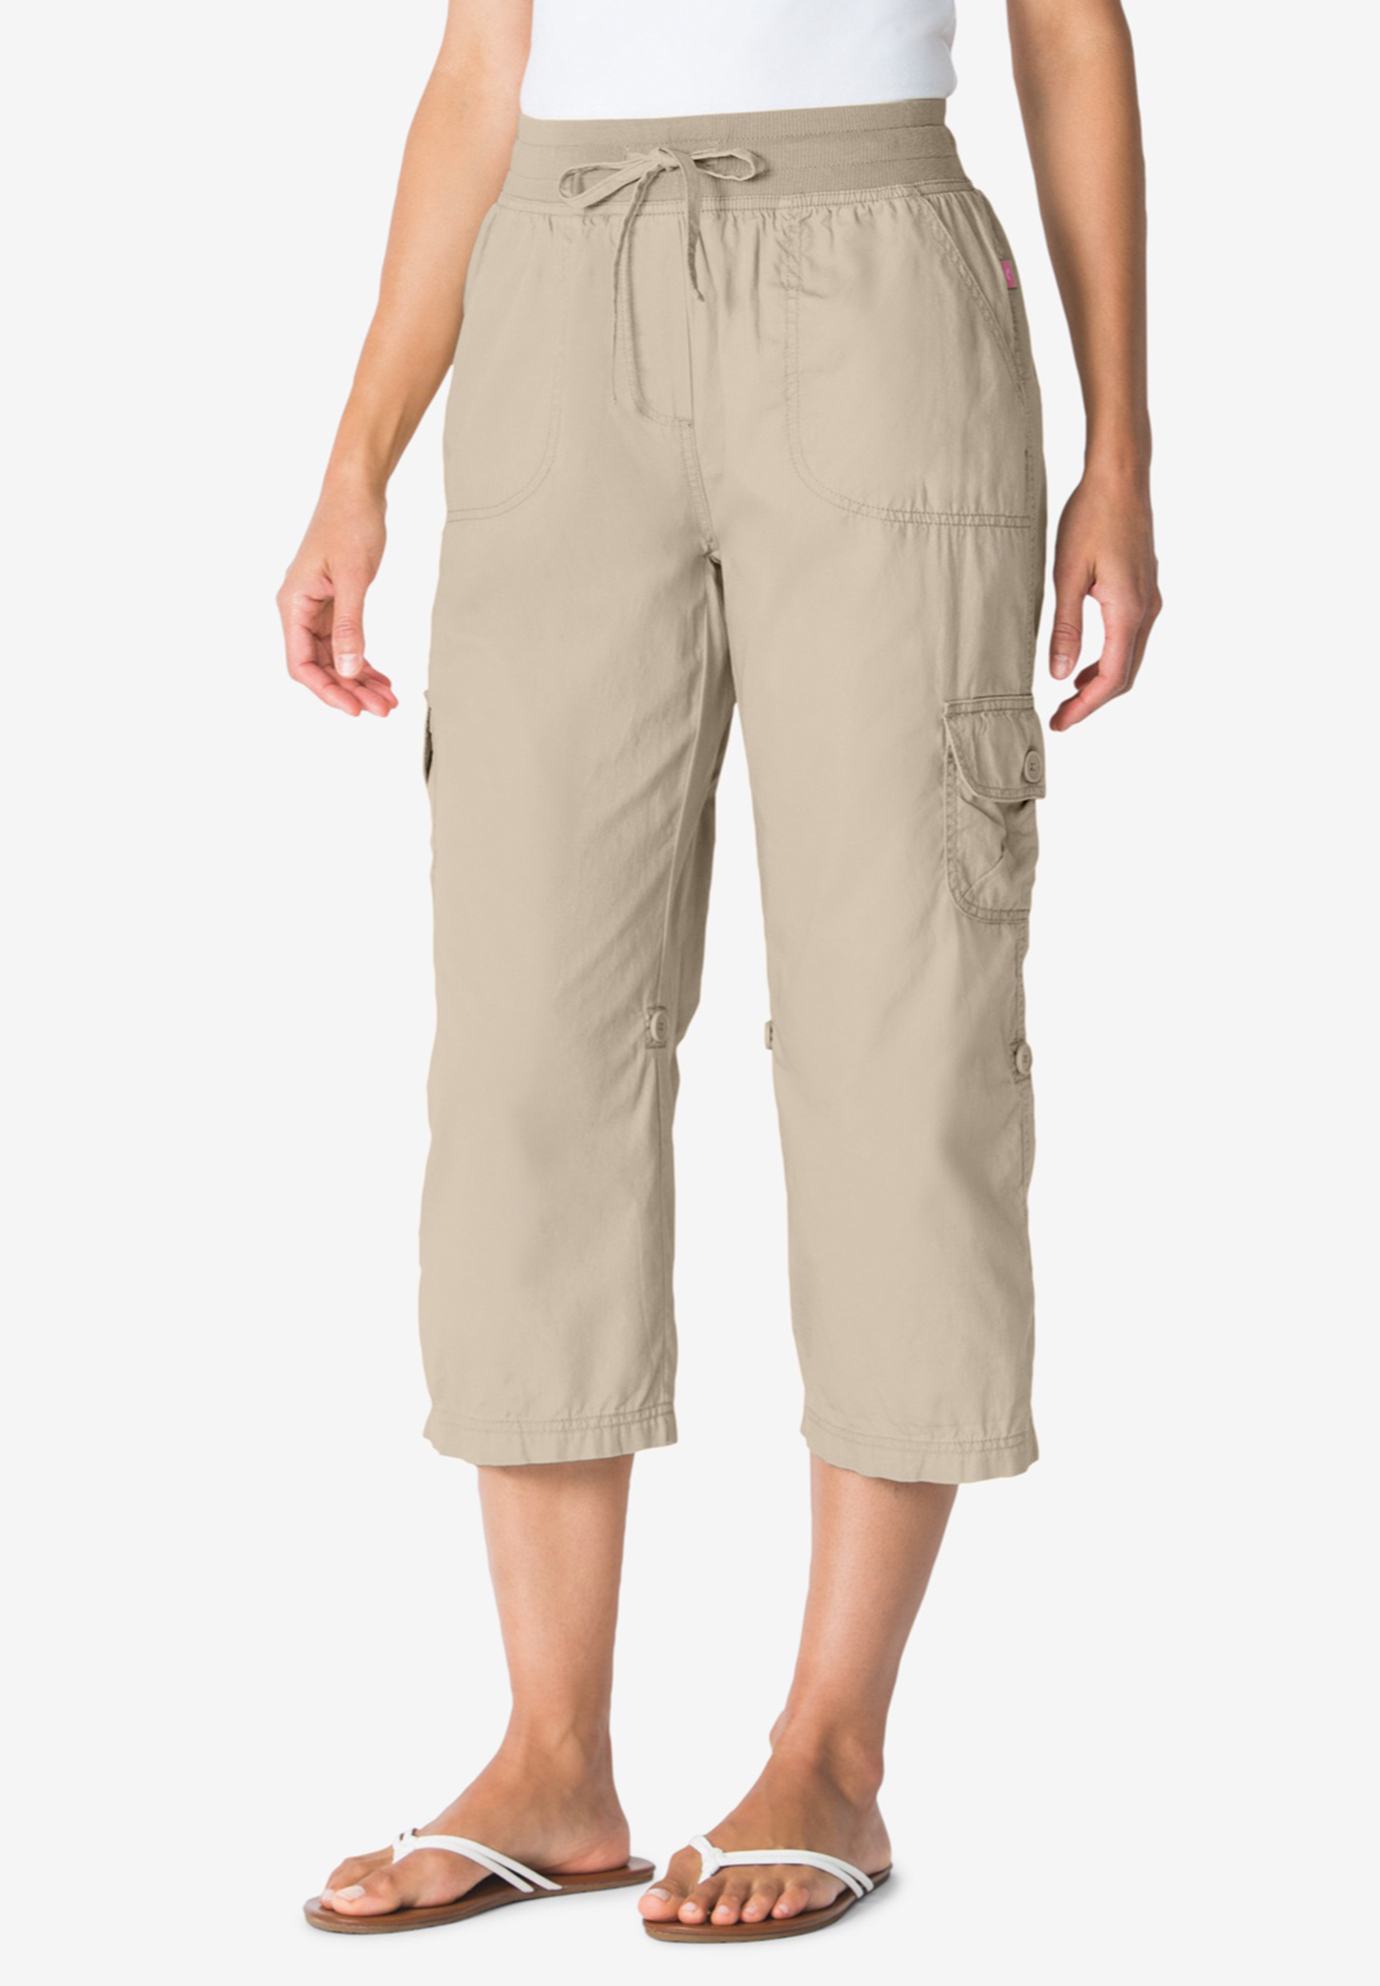 0933038cbc92b Convertible Length Cargo Capri Pant| Plus Size Shorts & Capris ...